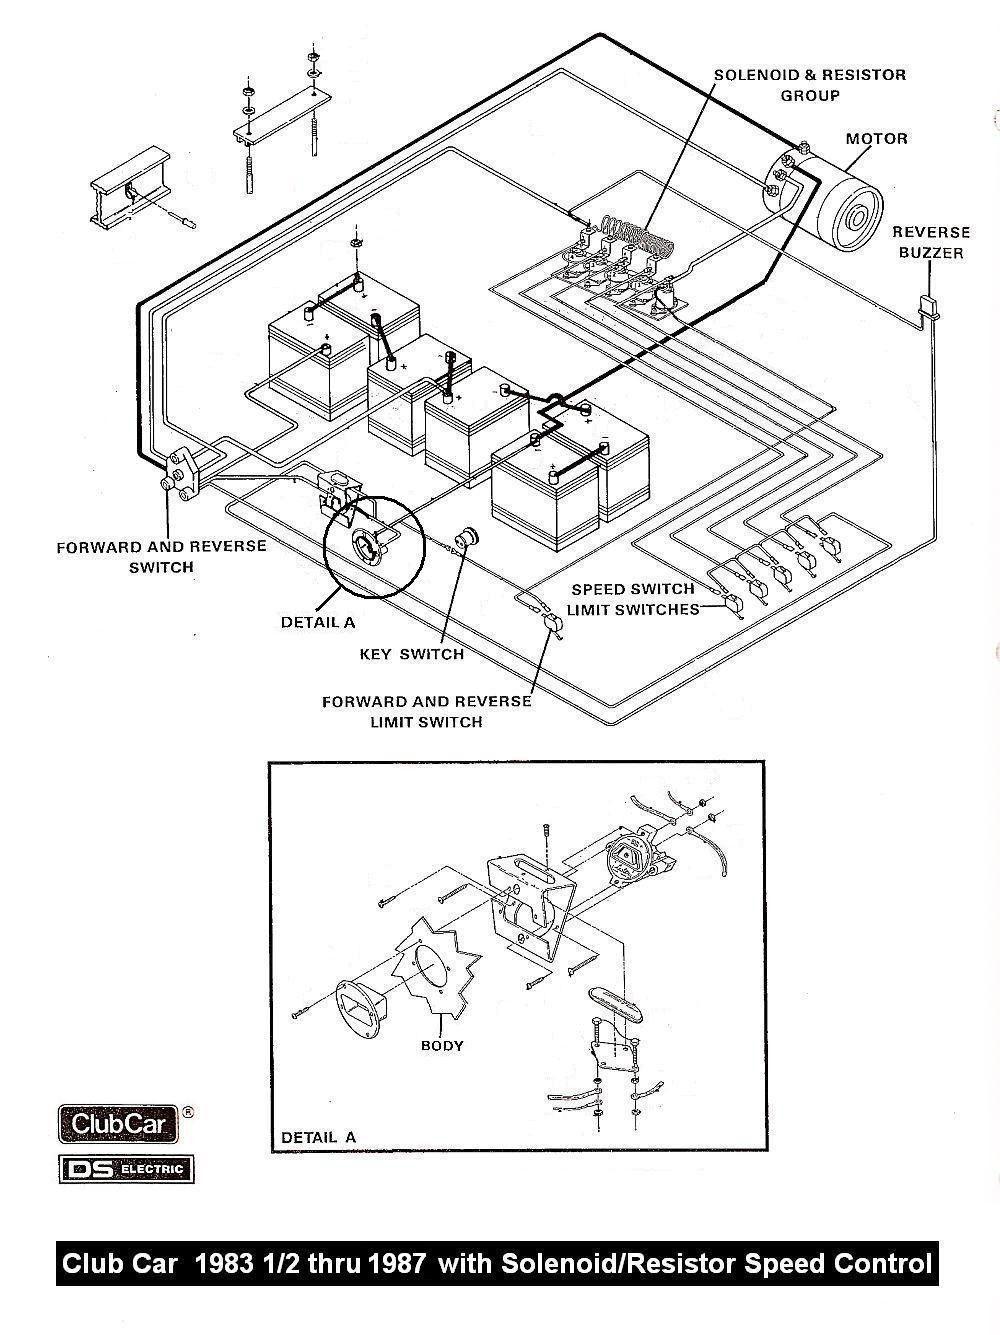 Wiring for 1988 Golf Cart C 1988 Club Car Direction Control Switch Wiring Scmatic In 2021 … Of Wiring for 1988 Golf Cart C